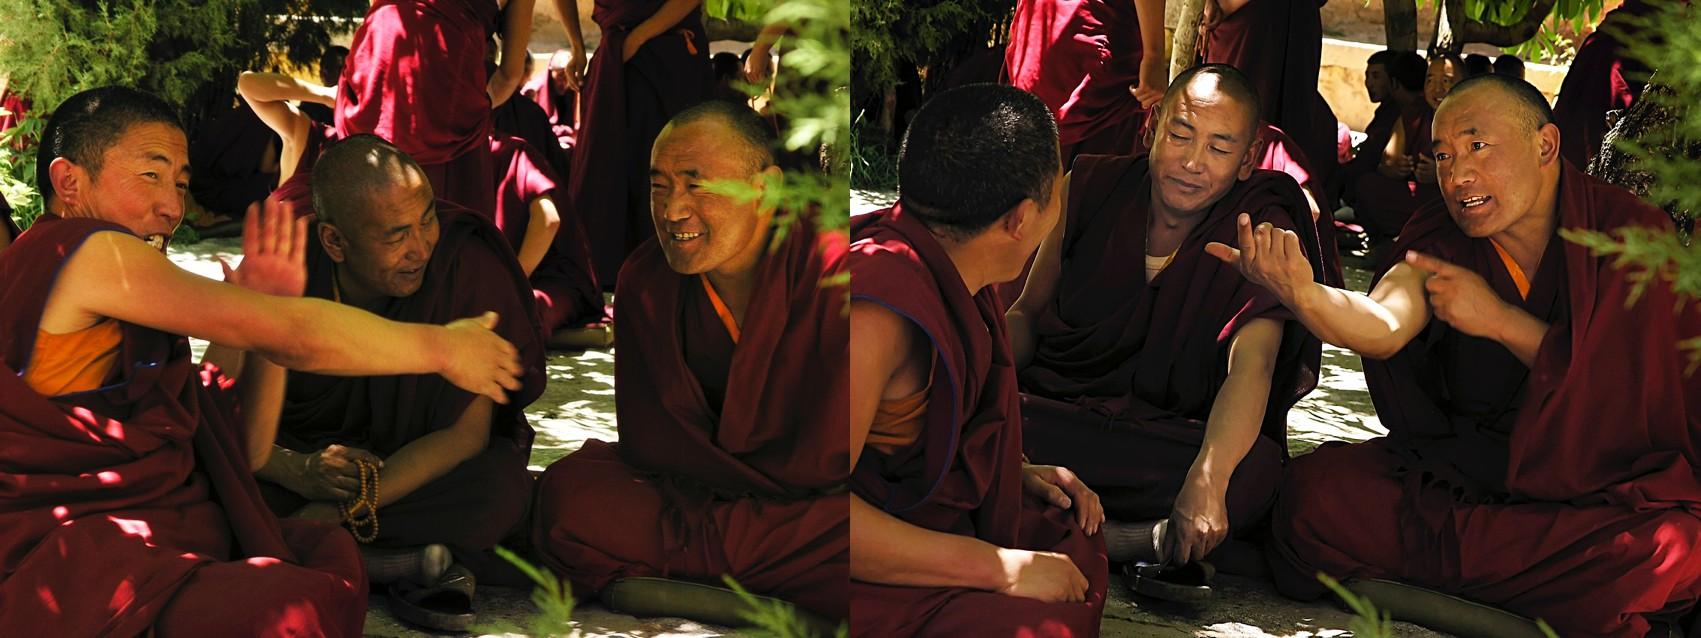 Tibetan_Monks_2